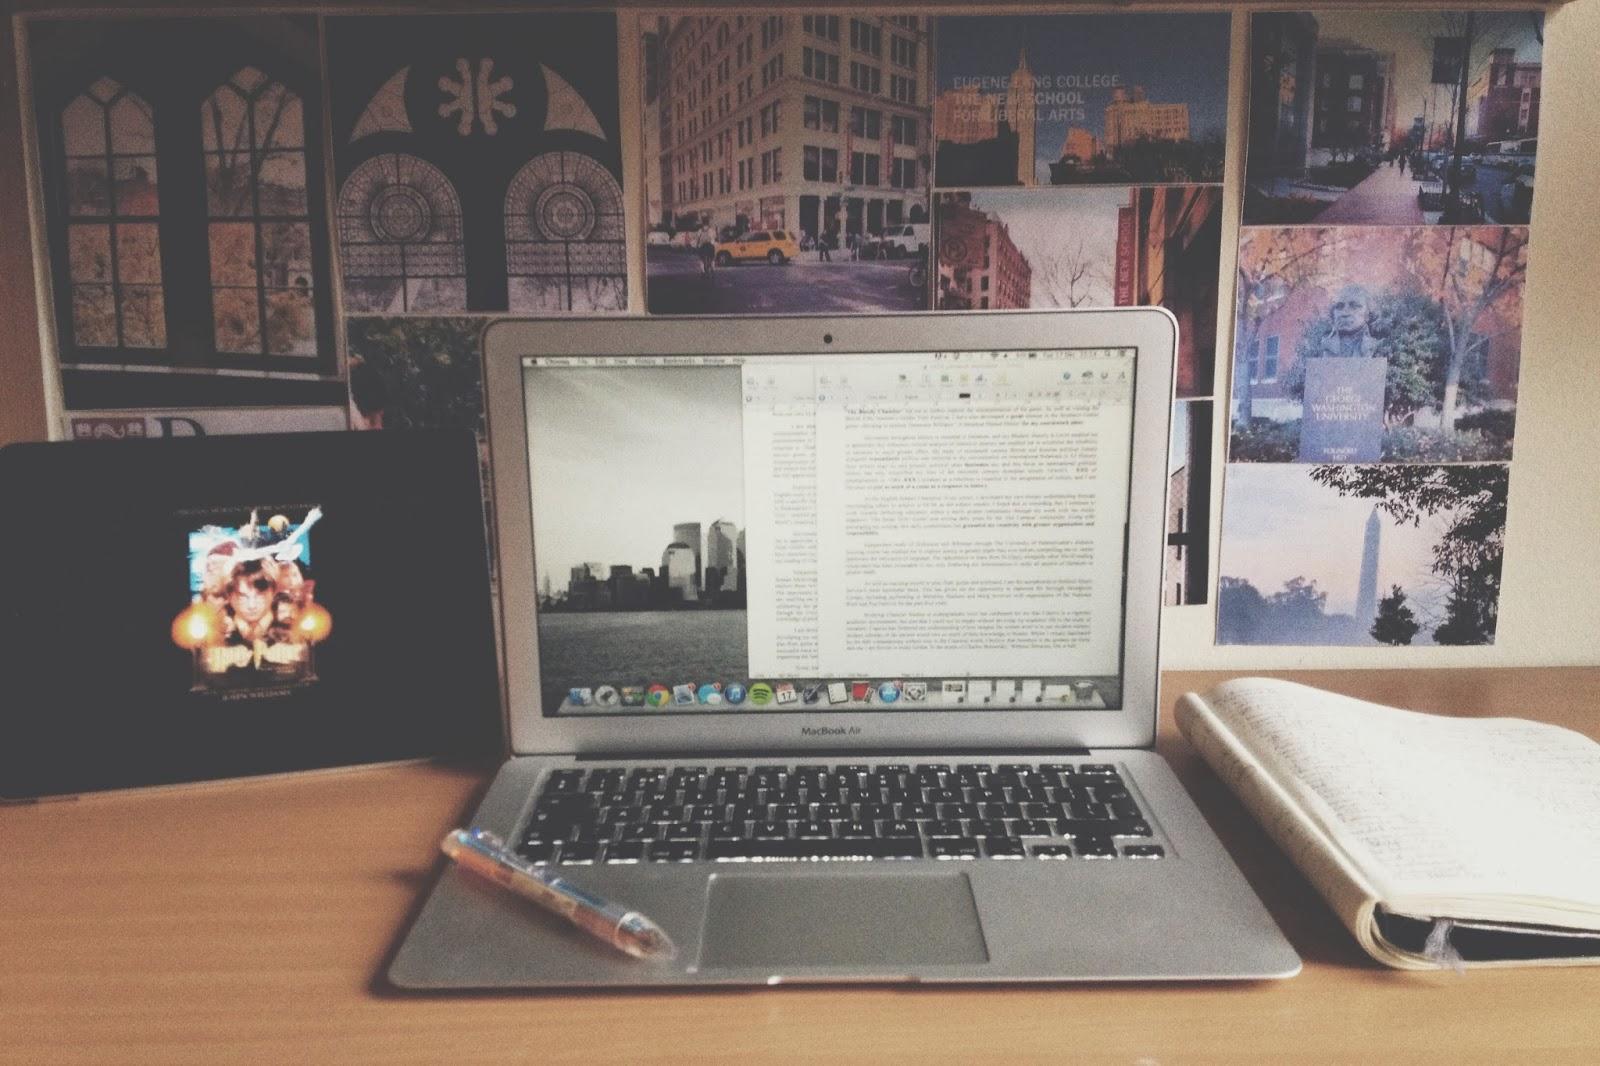 i have no motivation to write my essay